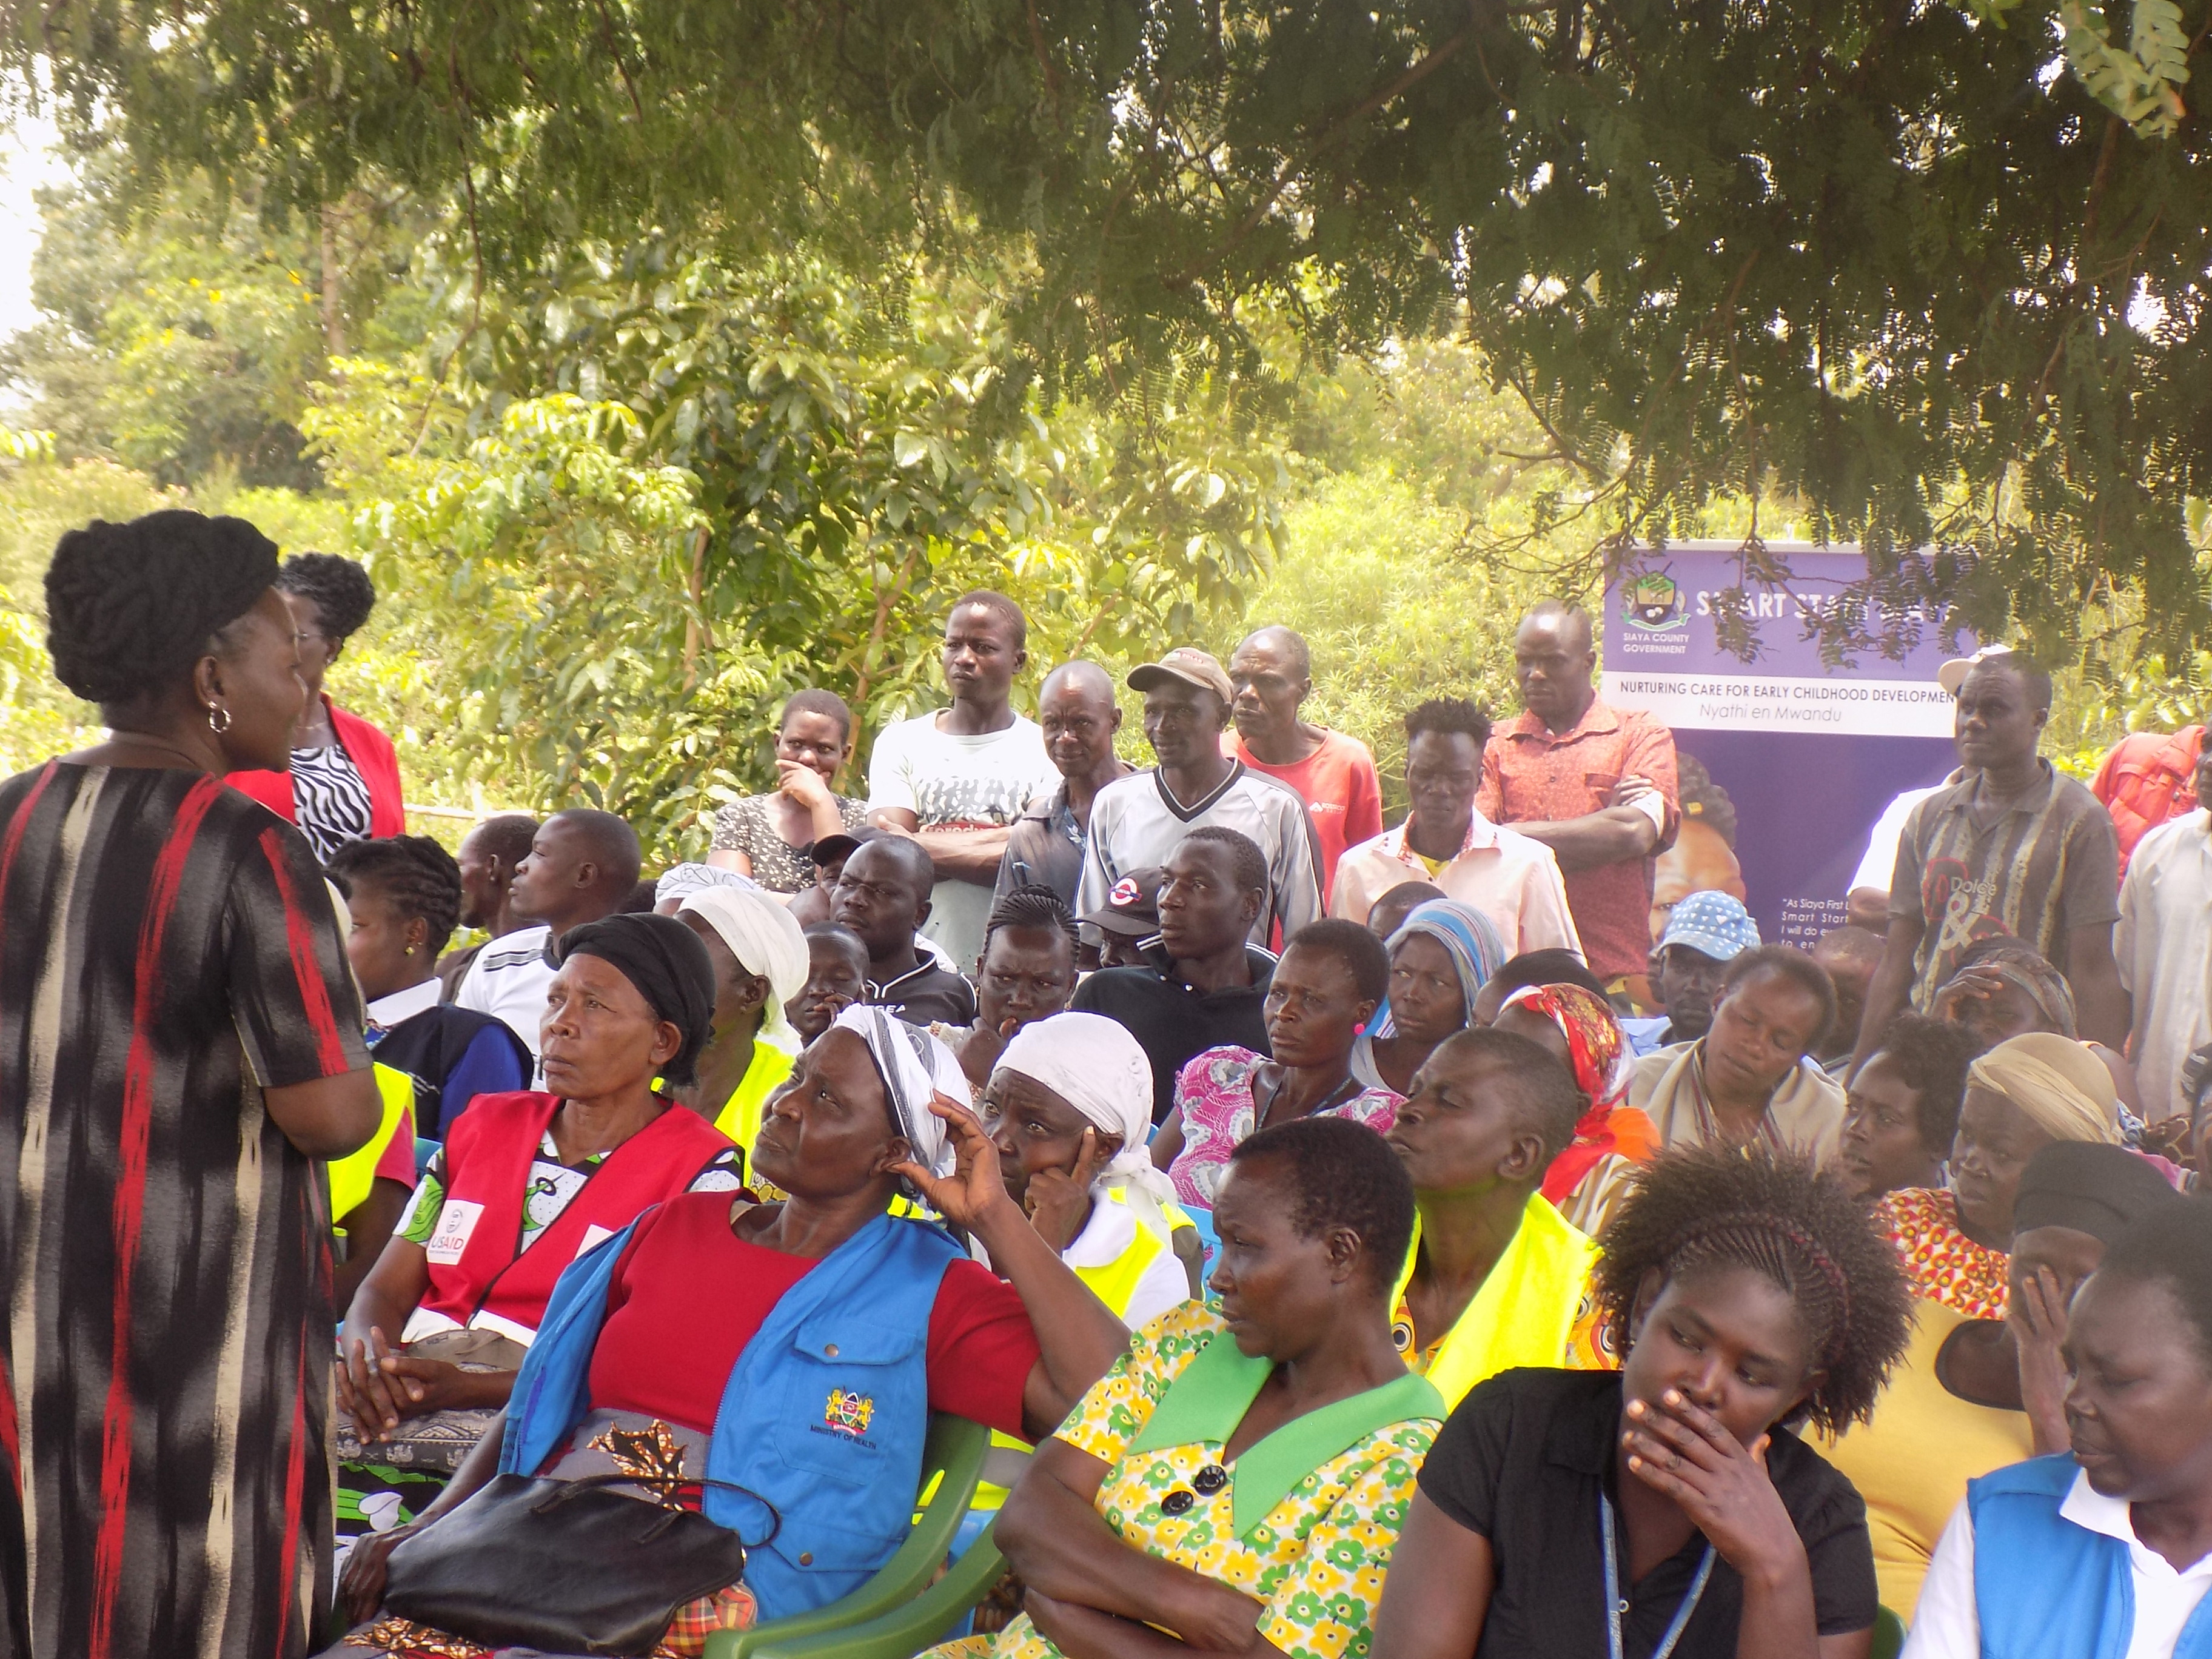 RESIDENTS OF NDAYI,CENTRAL ALEGO WARD SENSITIZED ON NURTURING CARE FOR ECD.